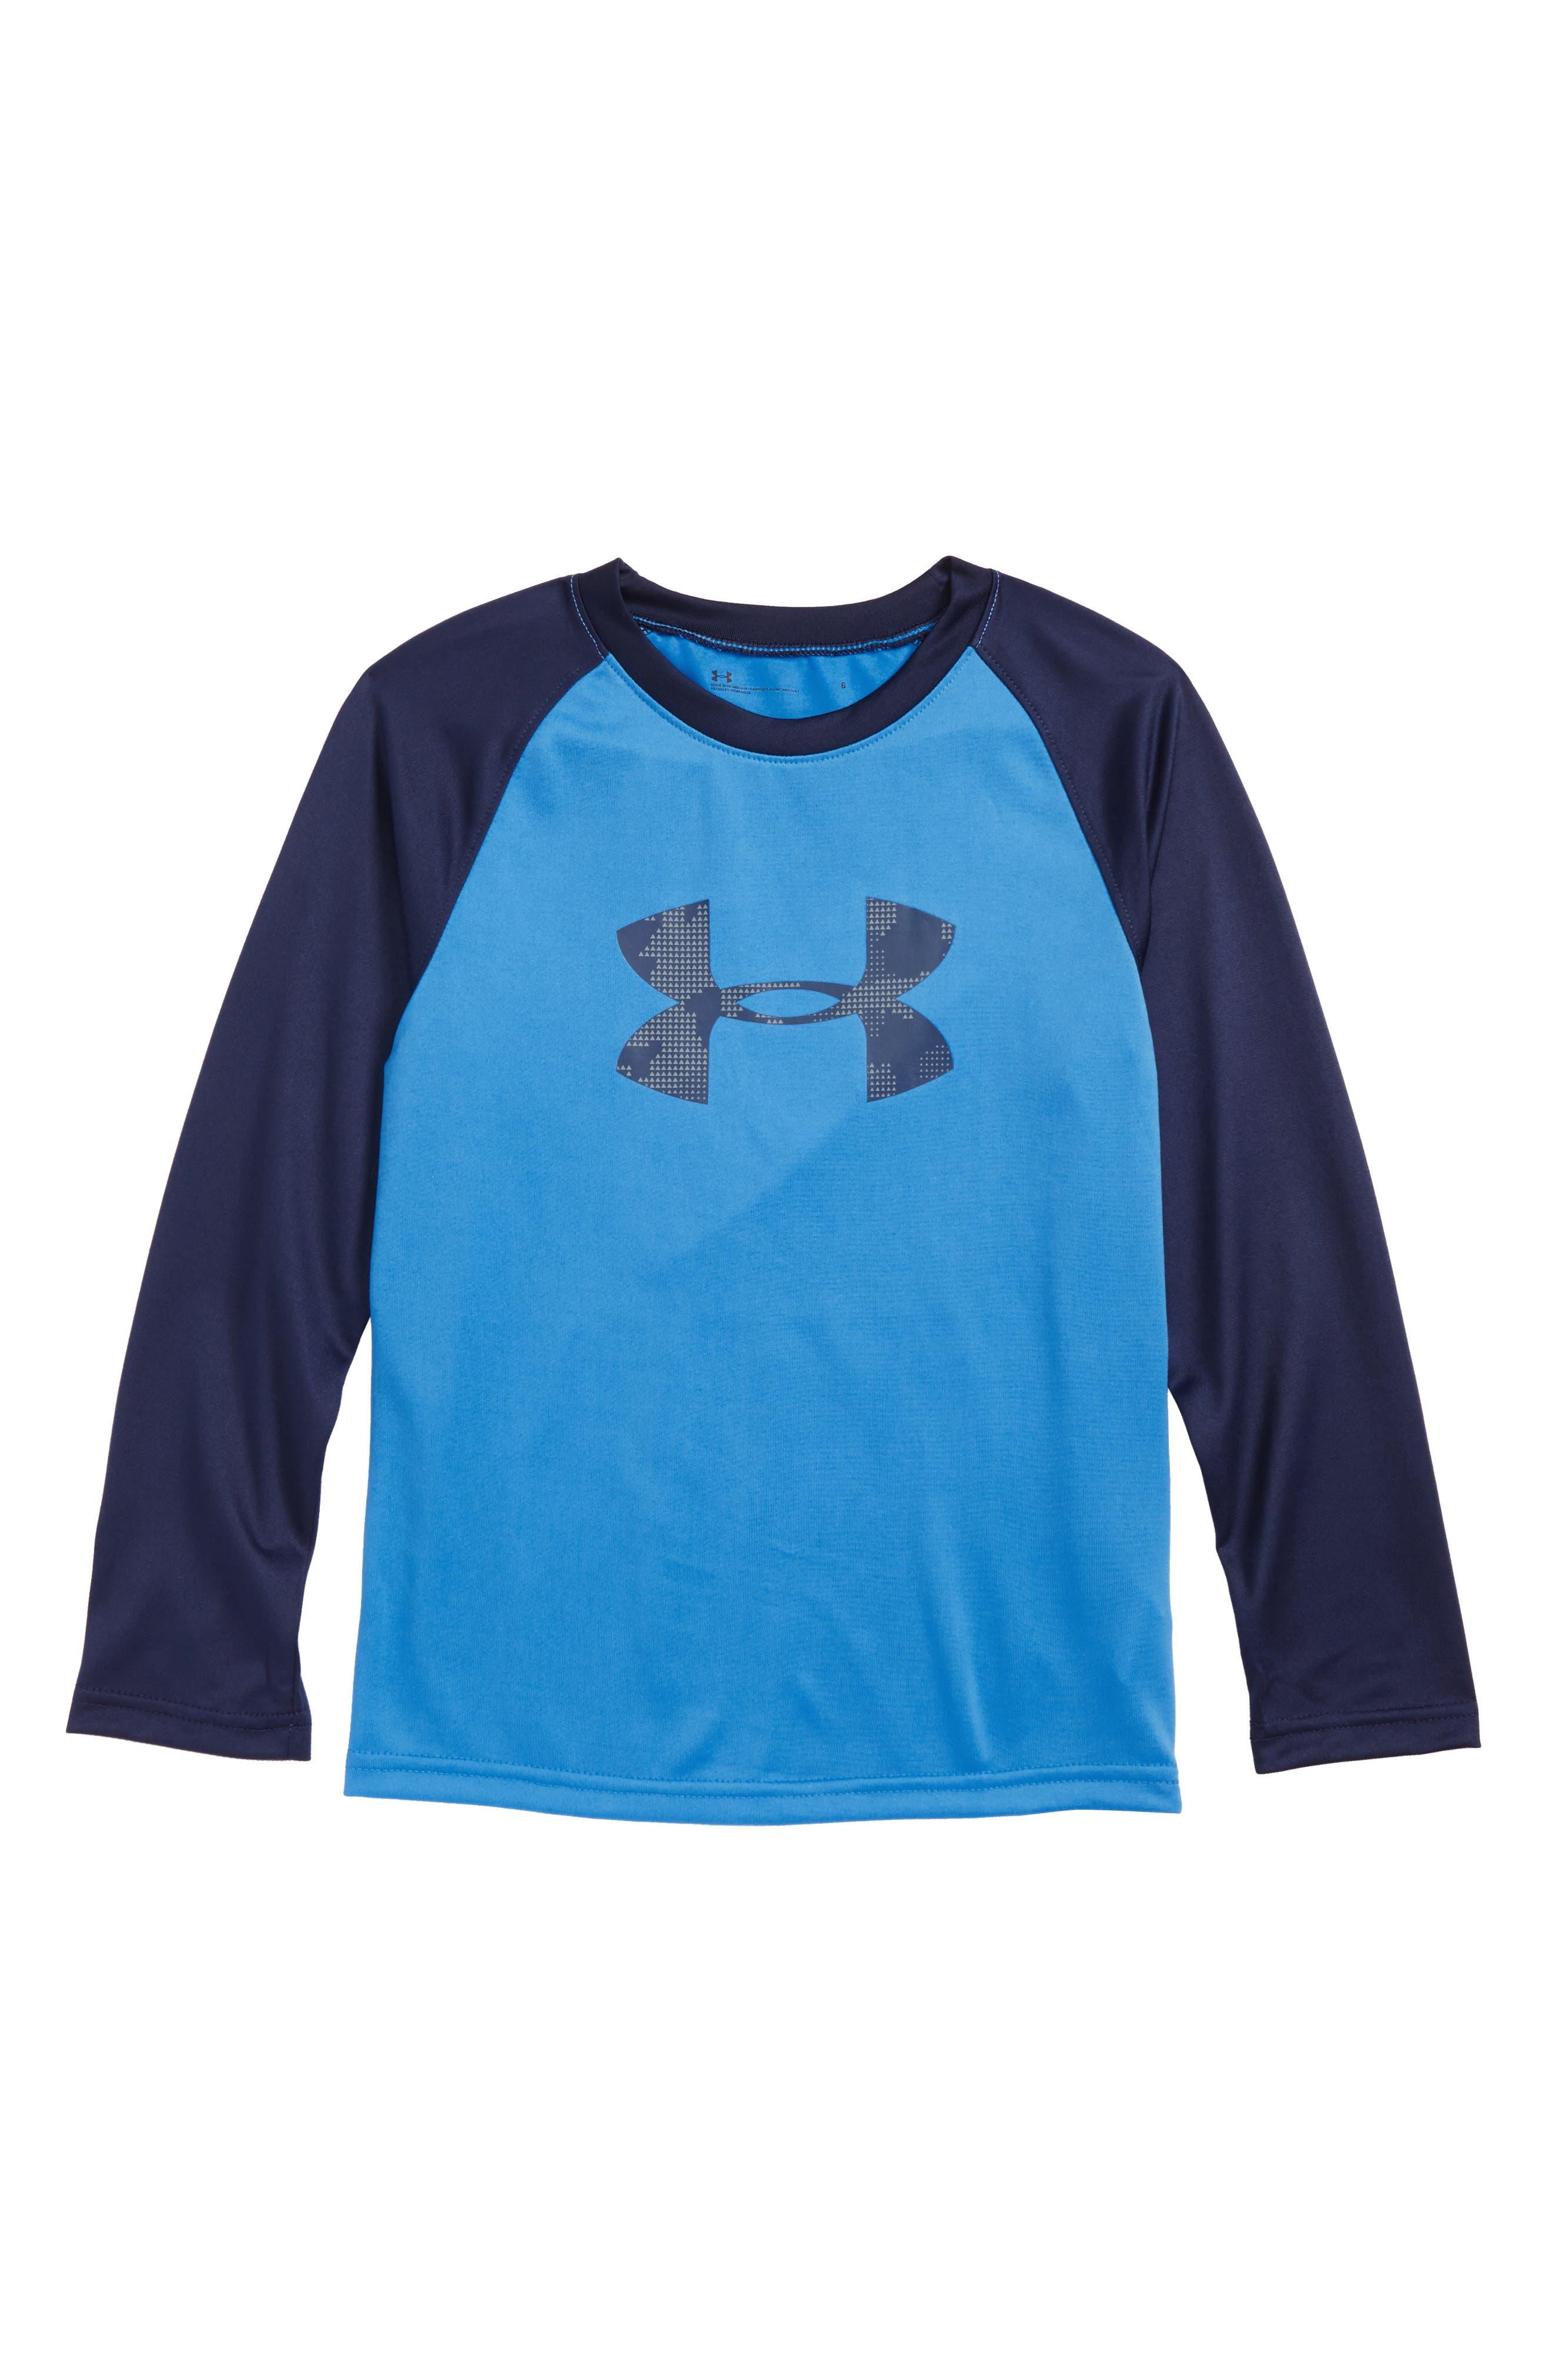 Alternate Image 1 Selected - Under Armour Camo Big Logo HeatGear® T-Shirt (Toddler Boys & Little Boys)